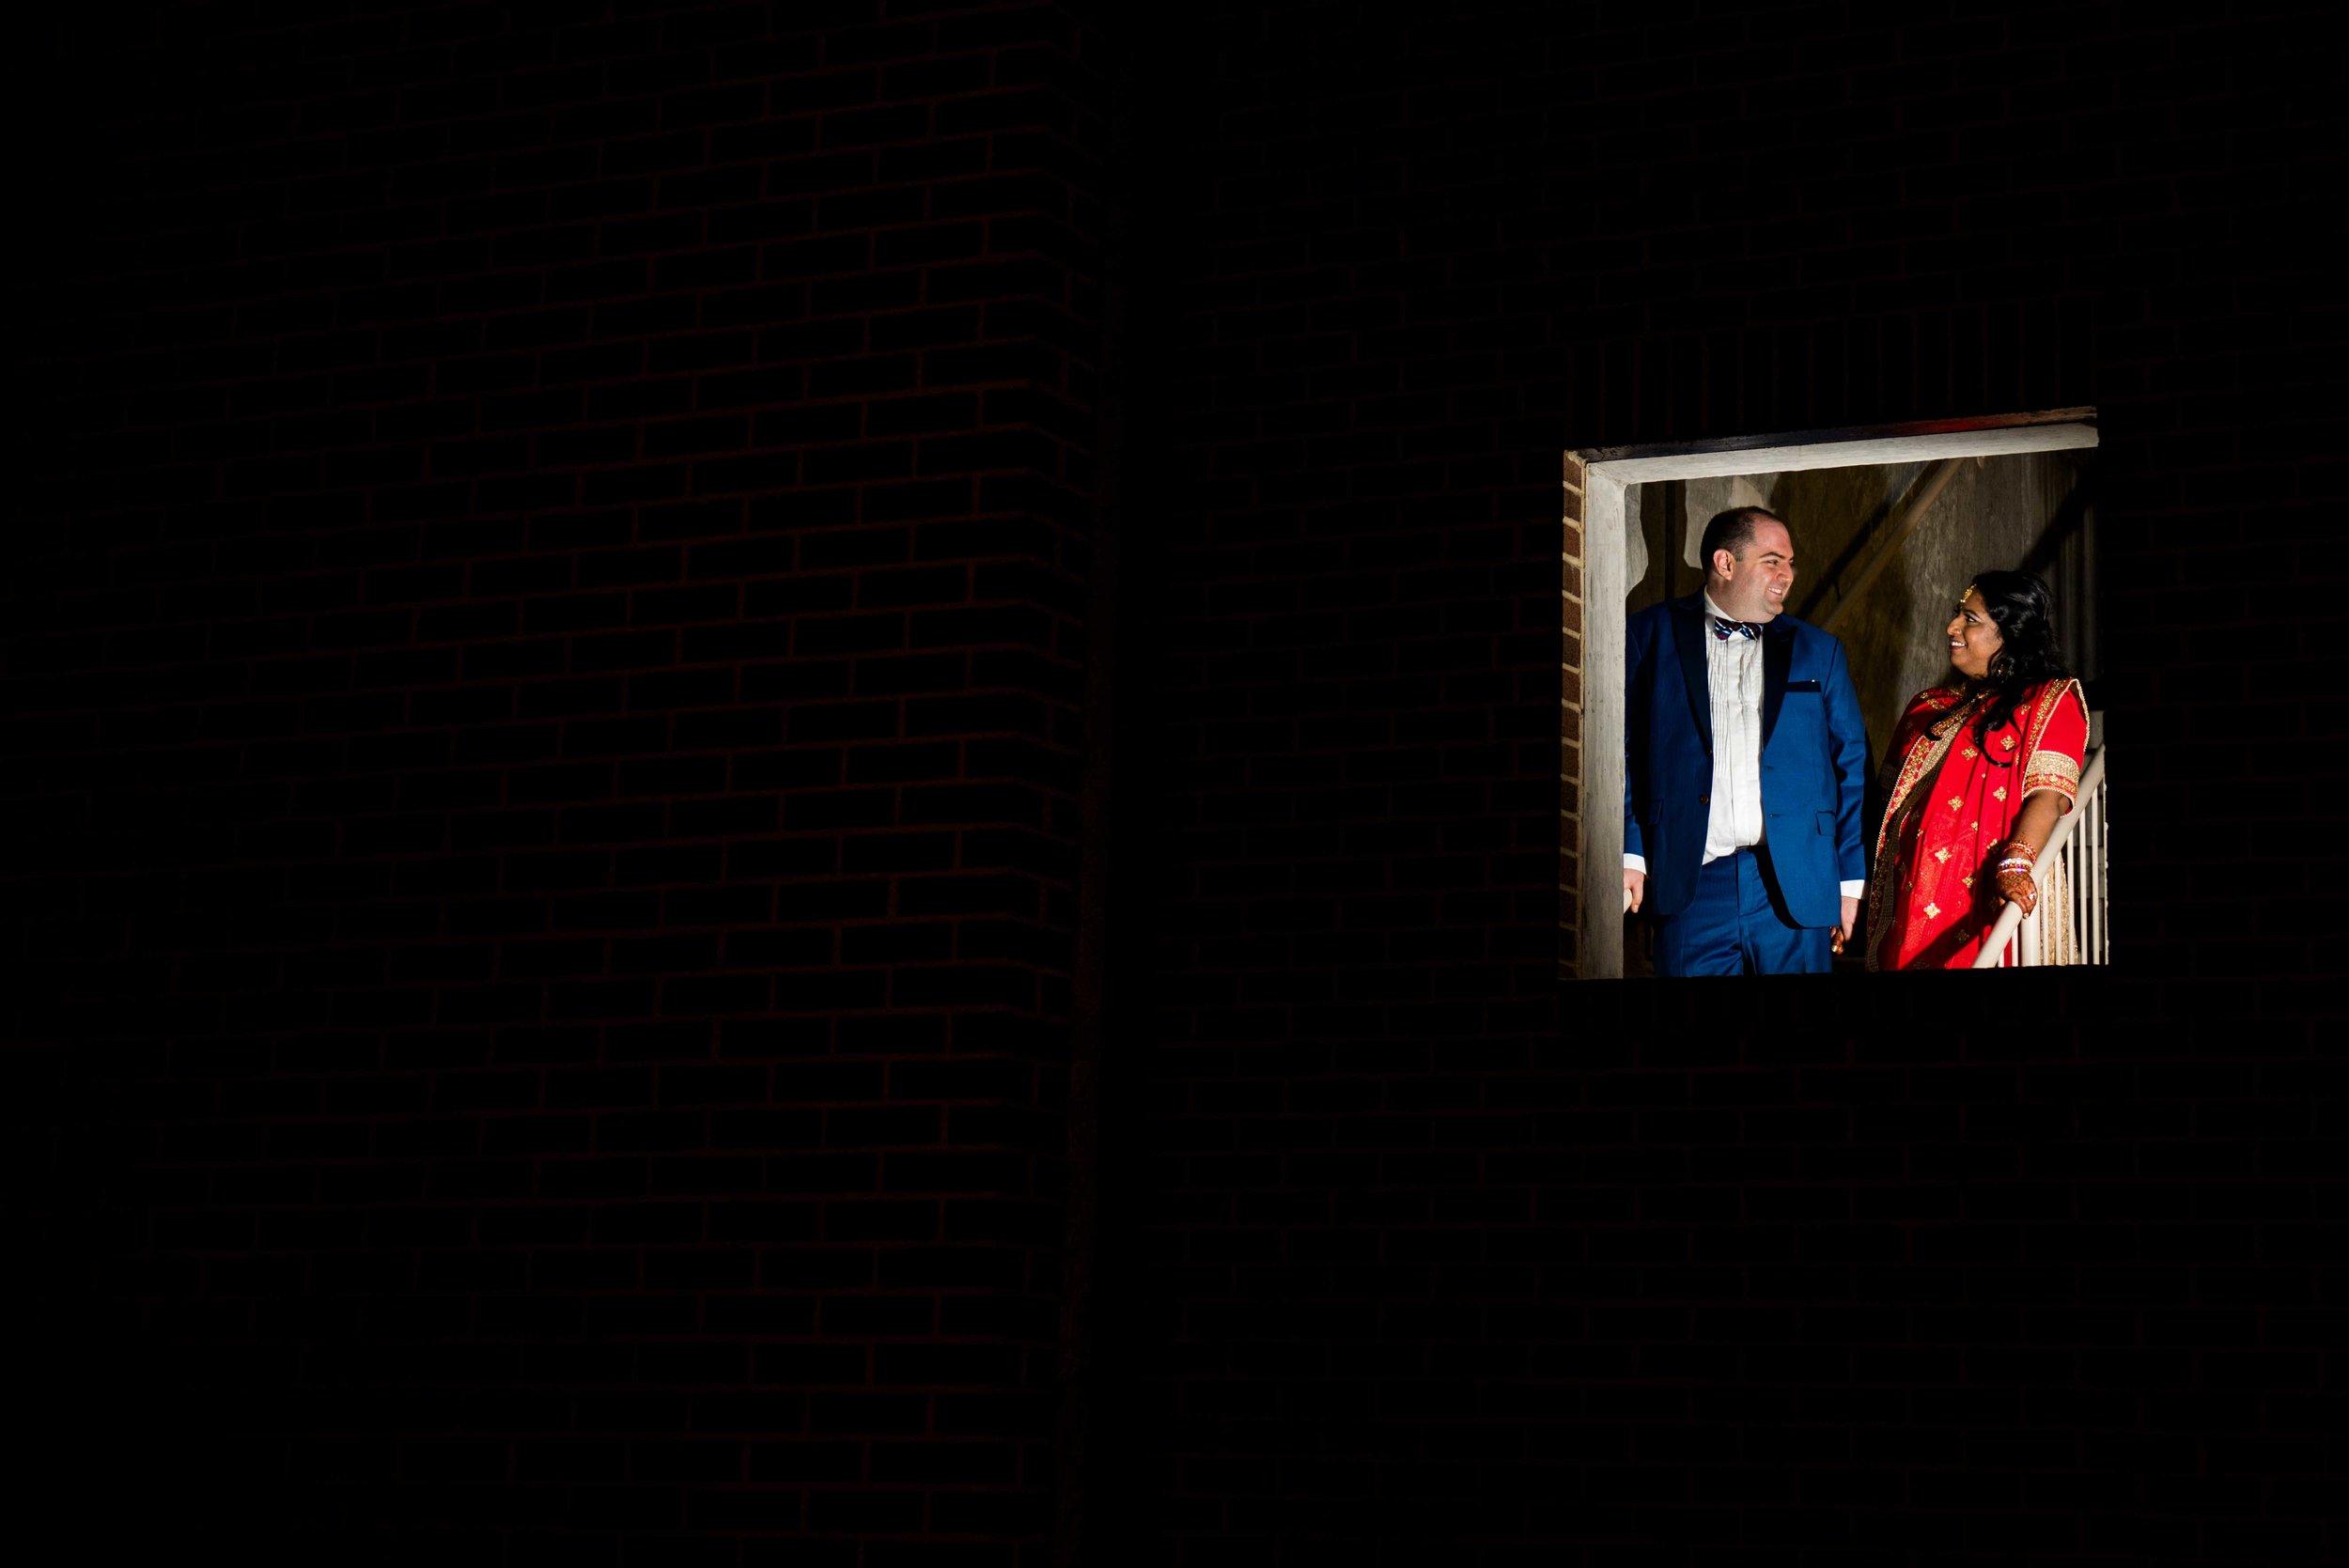 AlexandriaWedding-Blake&Sahaja-NightPhotos-43.jpg